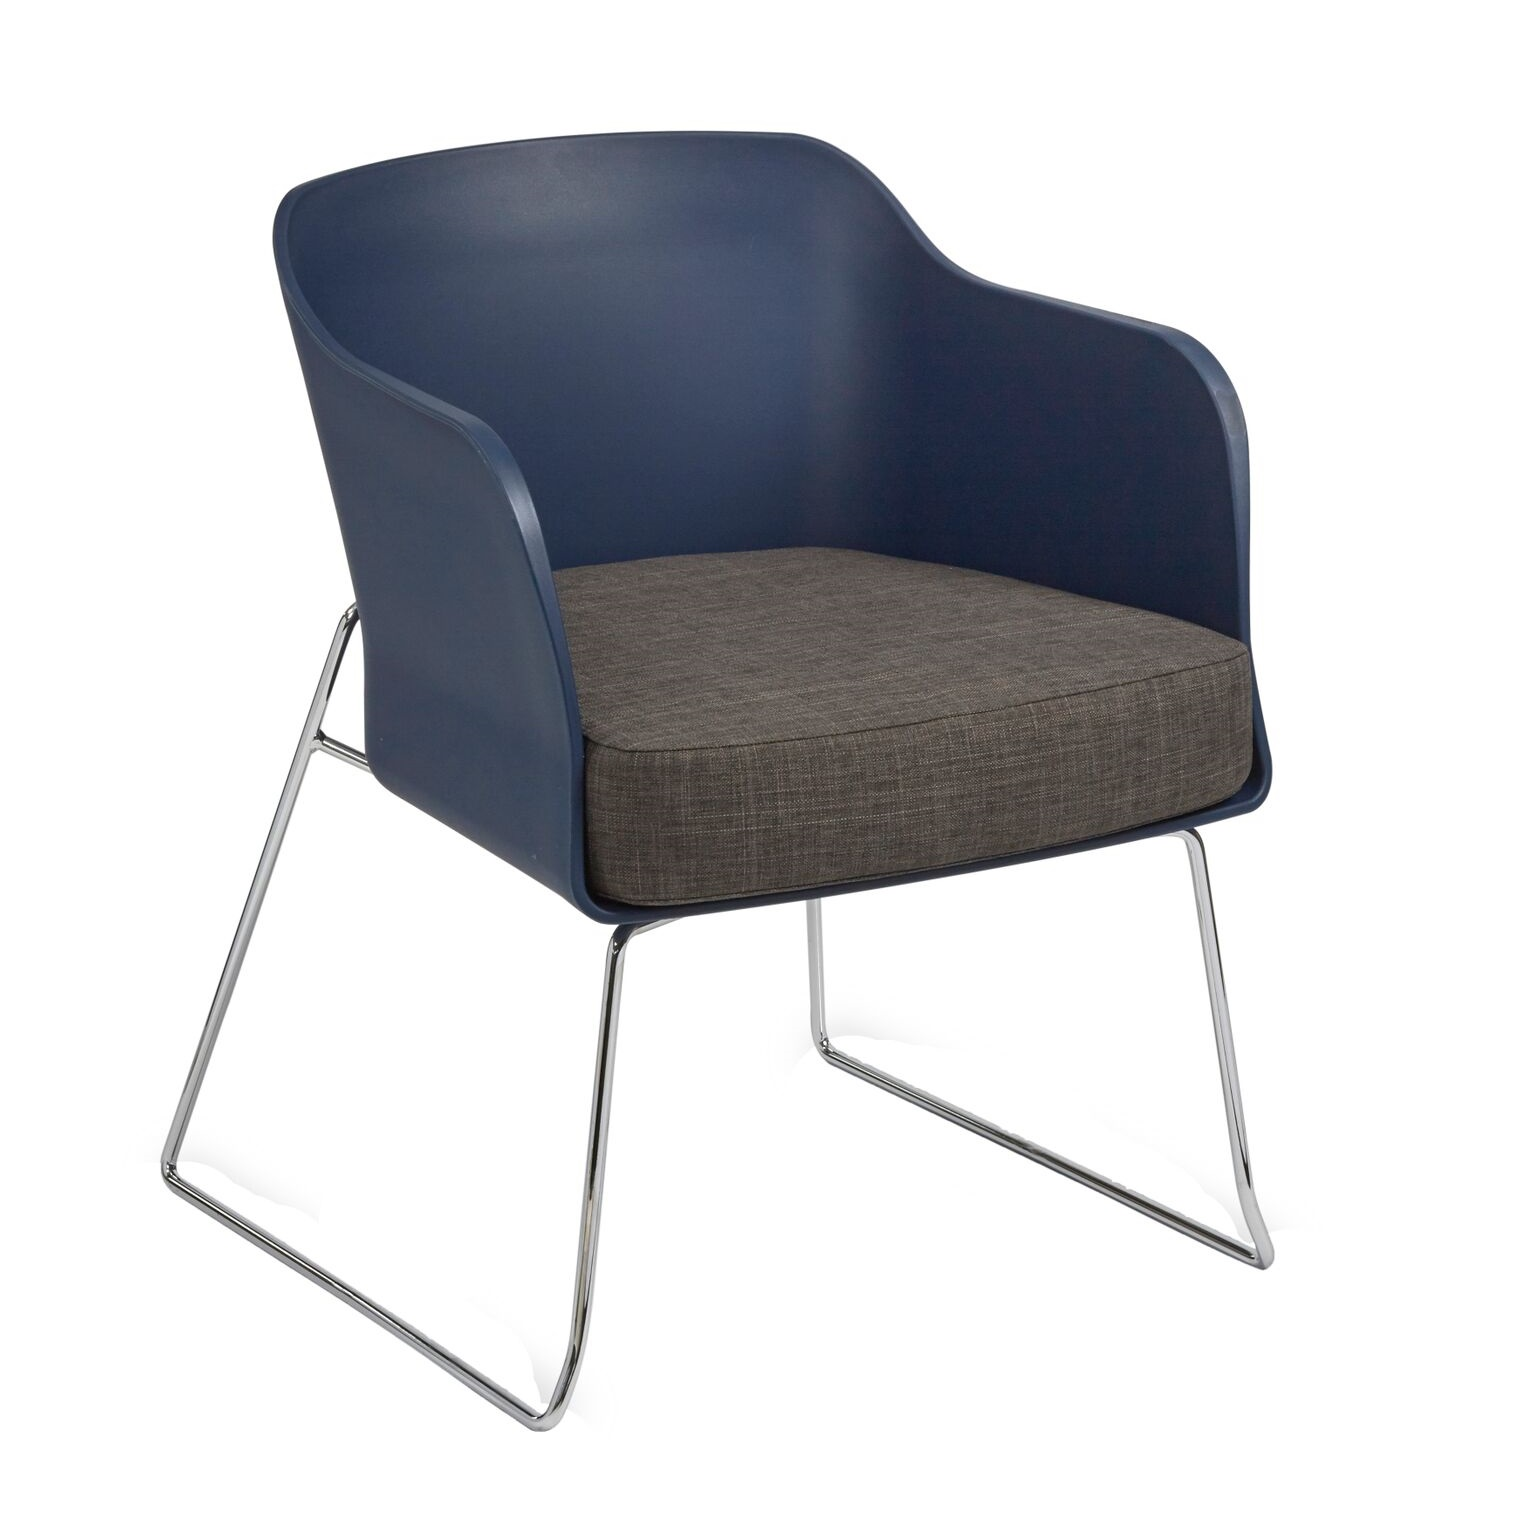 Astounding Timble Chrome Arm Chairs 4 Modern Colours Dailytribune Chair Design For Home Dailytribuneorg